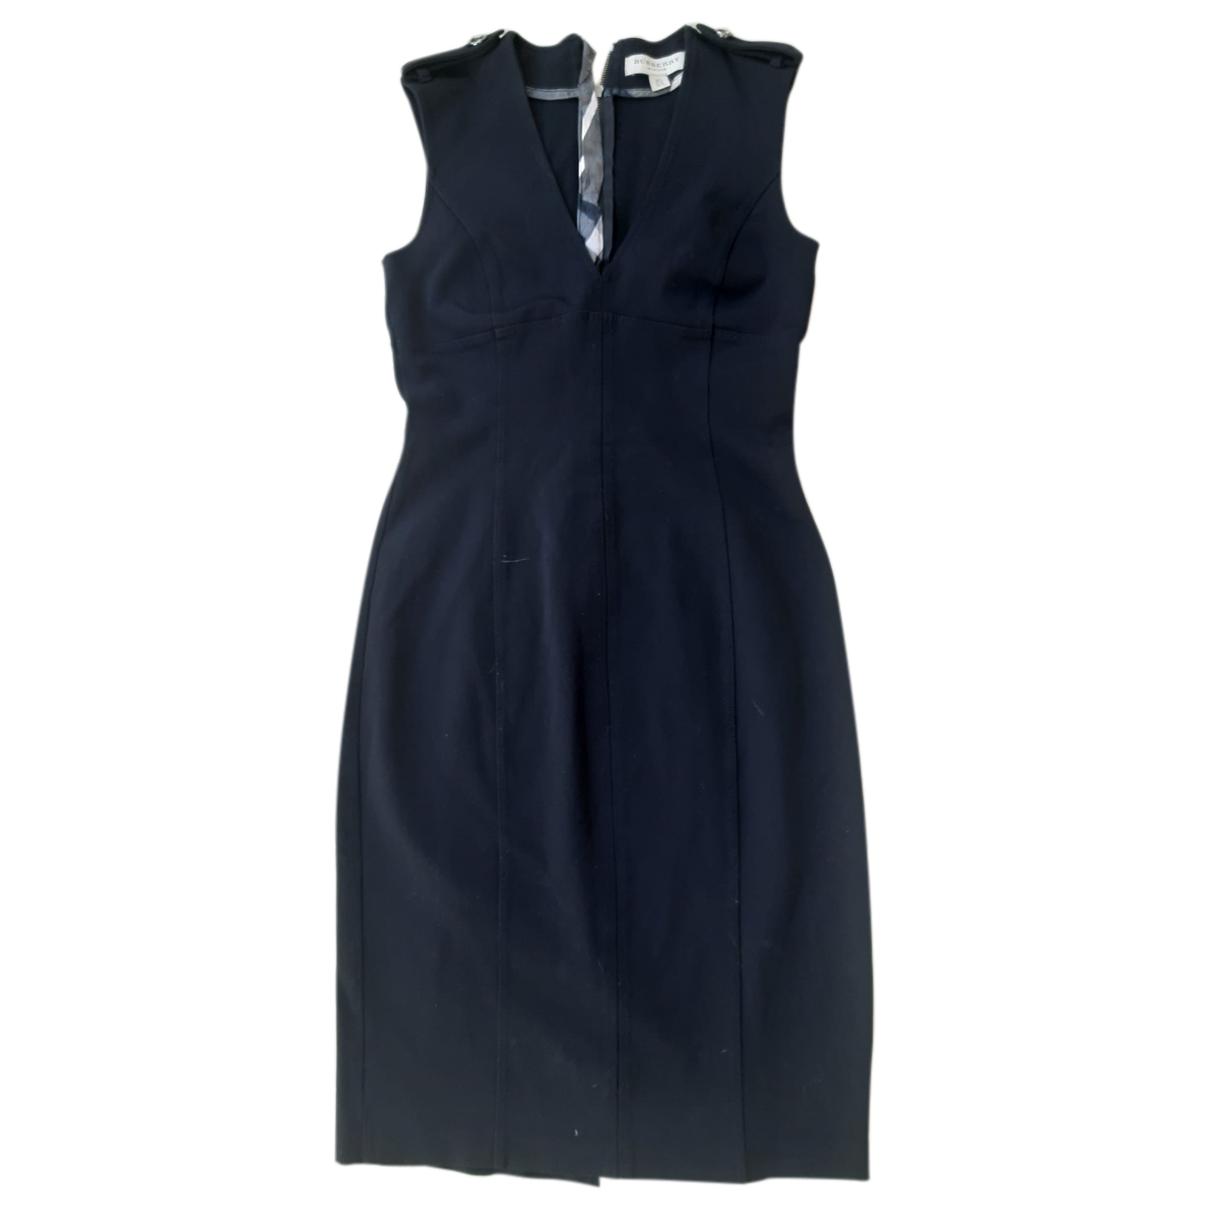 Burberry \N Kleid in  Schwarz Polyester